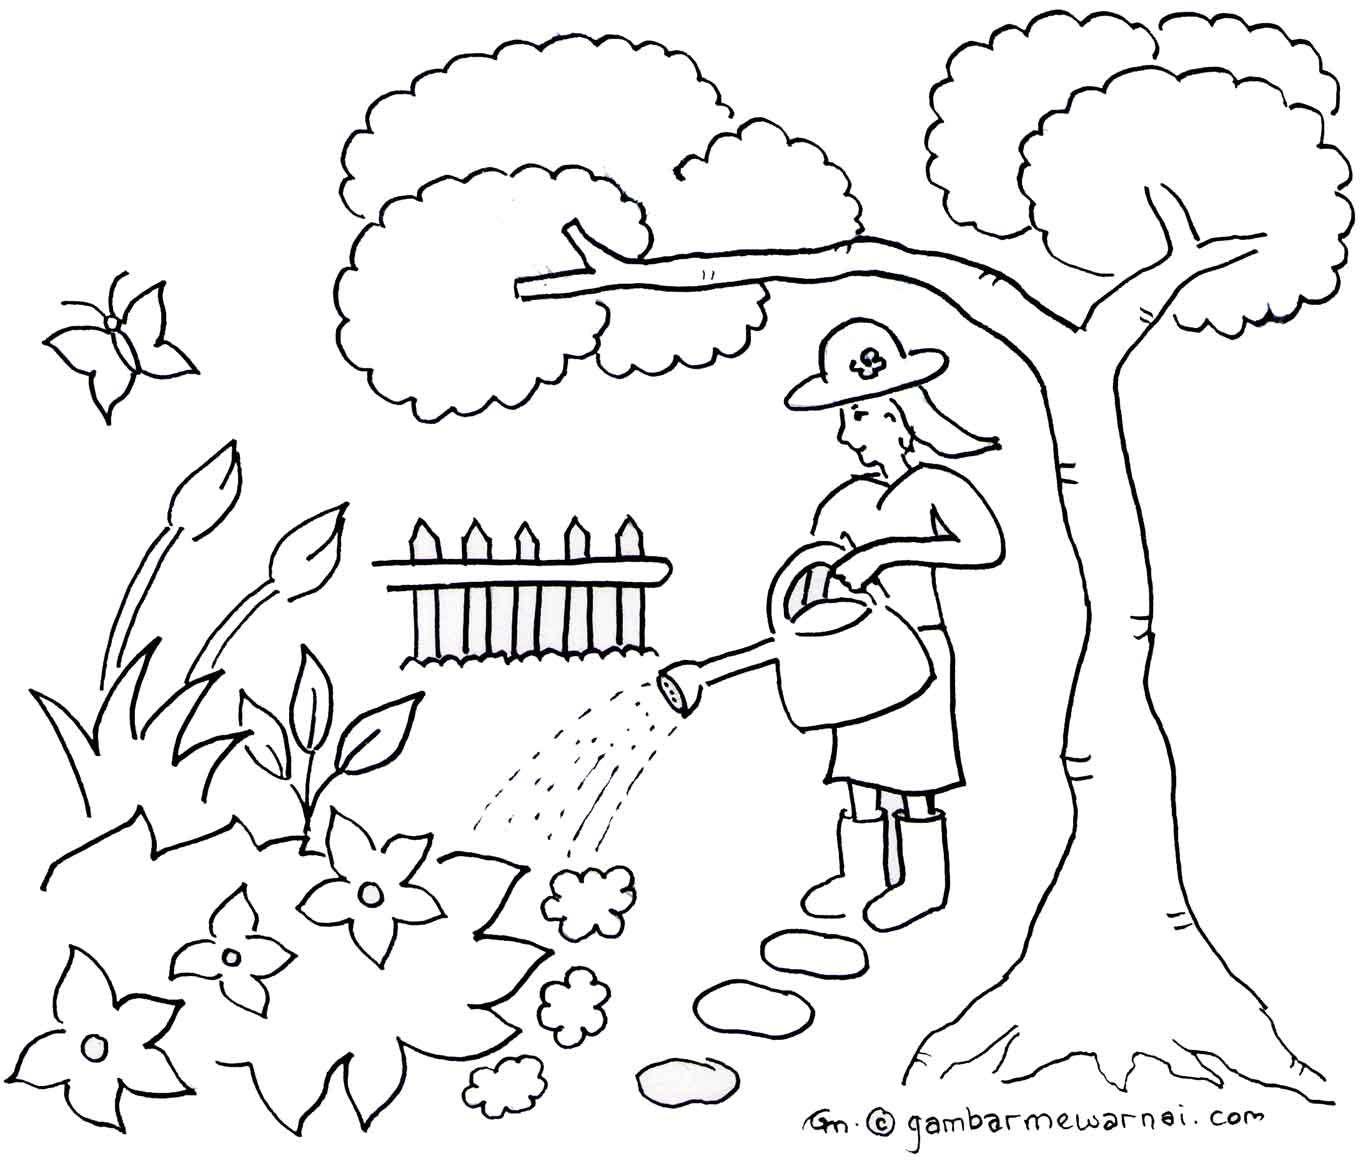 Mewarnai Taman Bunga Sketsa, Buku mewarnai, Warna